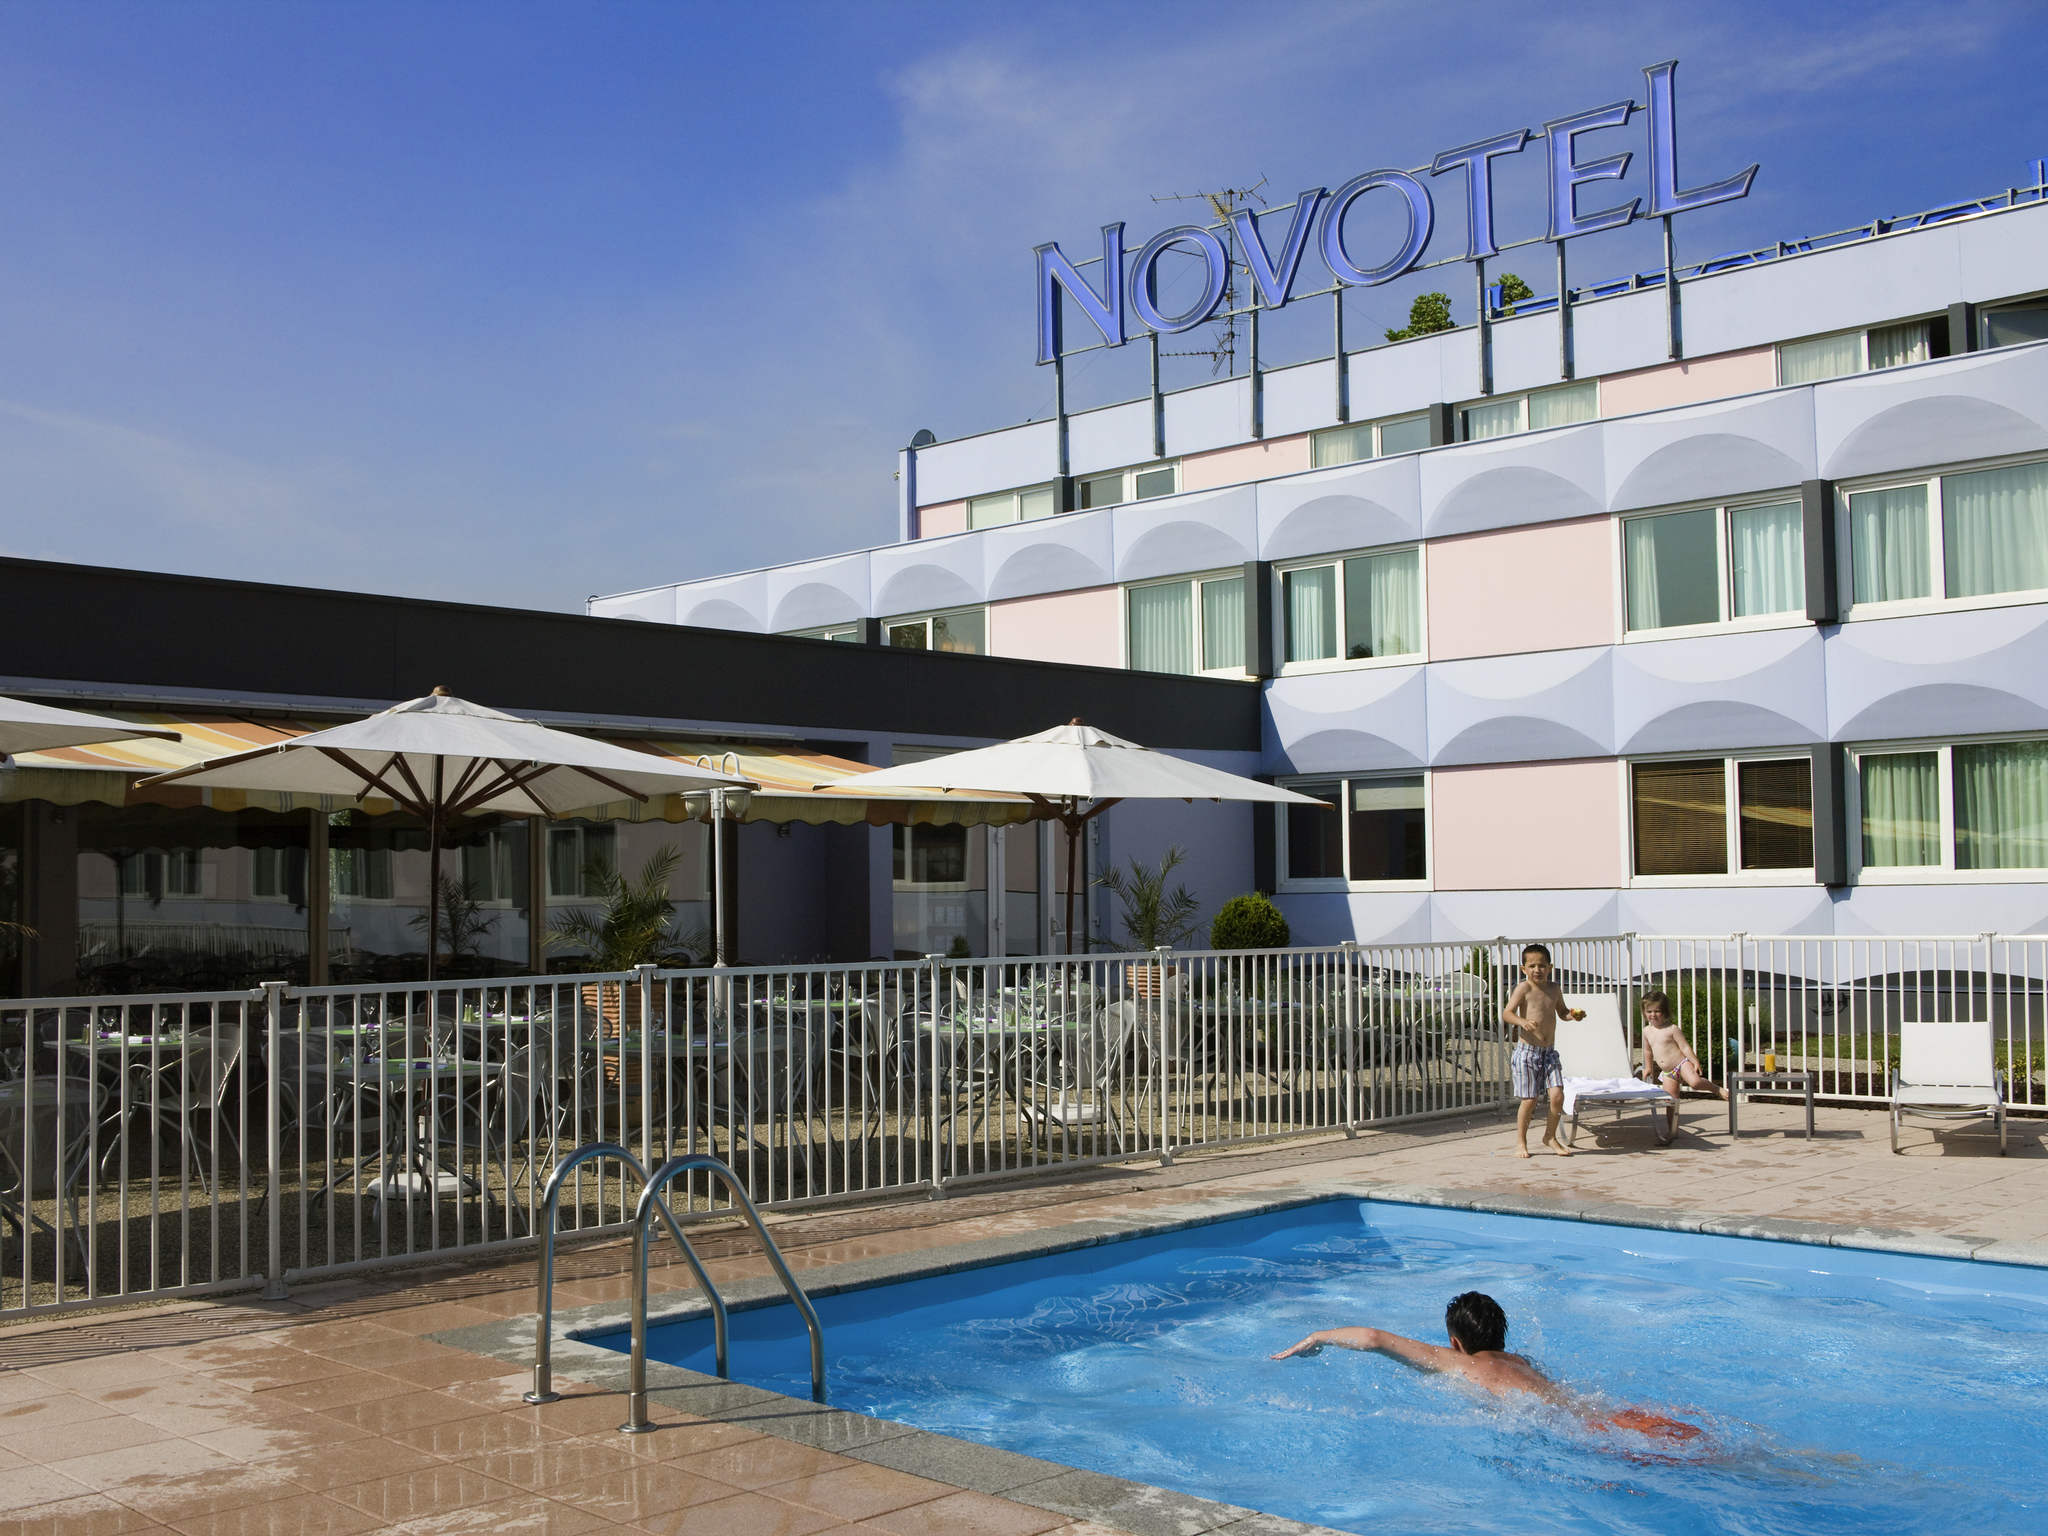 Hôtel - Novotel Mulhouse Bâle Fribourg